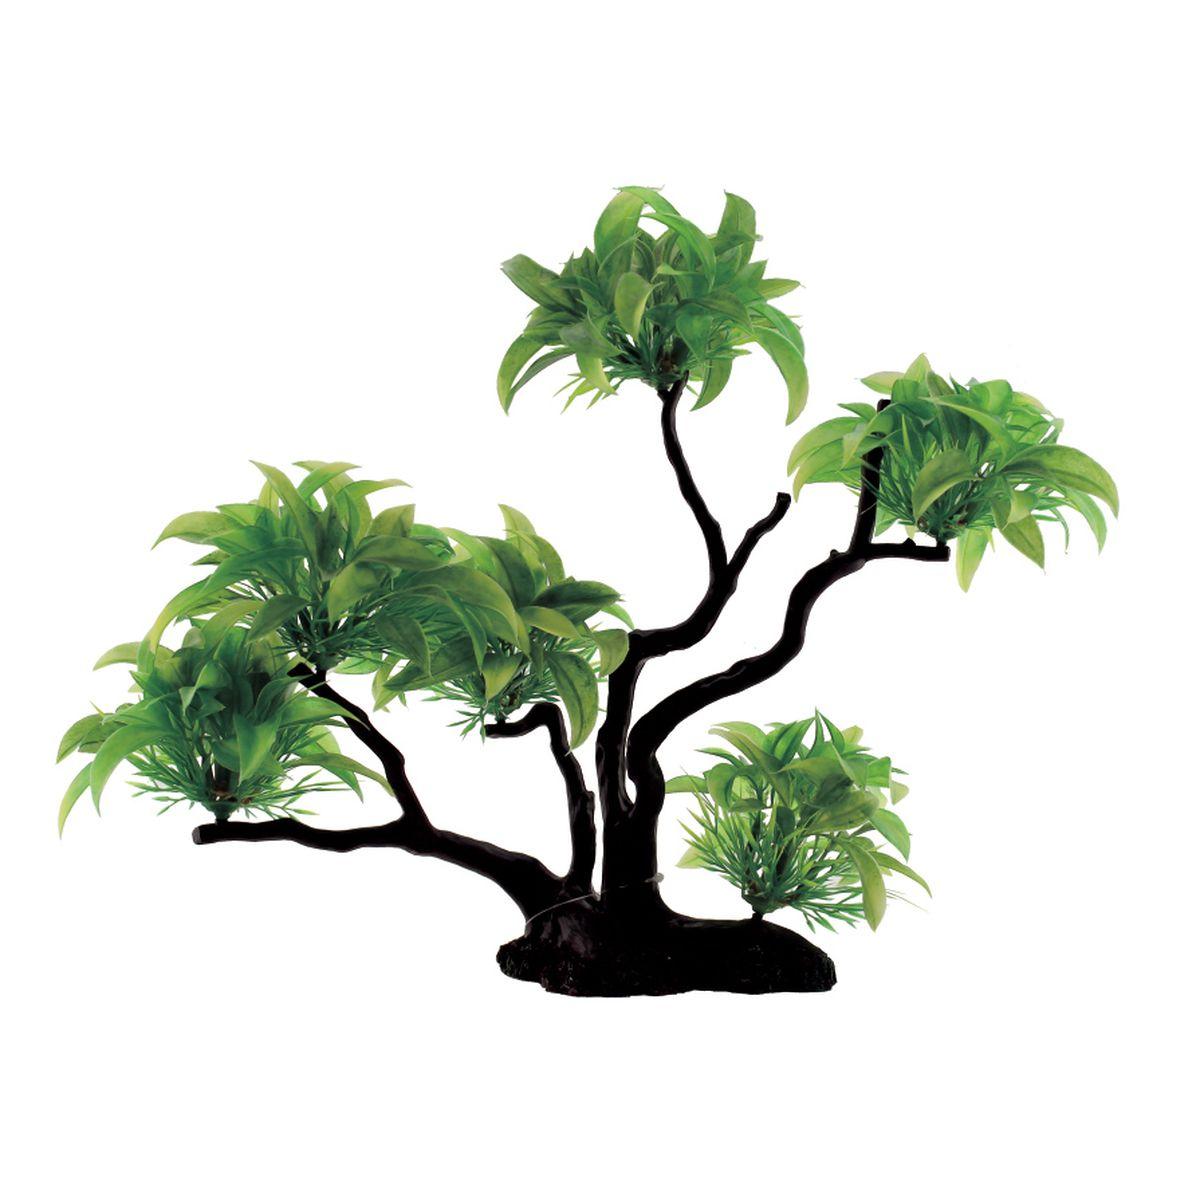 Композиция из растений для аквариума ArtUniq Буцефаландра, 32 x 15 x 30 смART-1130301Композиция из растений для аквариума ArtUniq Буцефаландра, 32 x 15 x 30 см